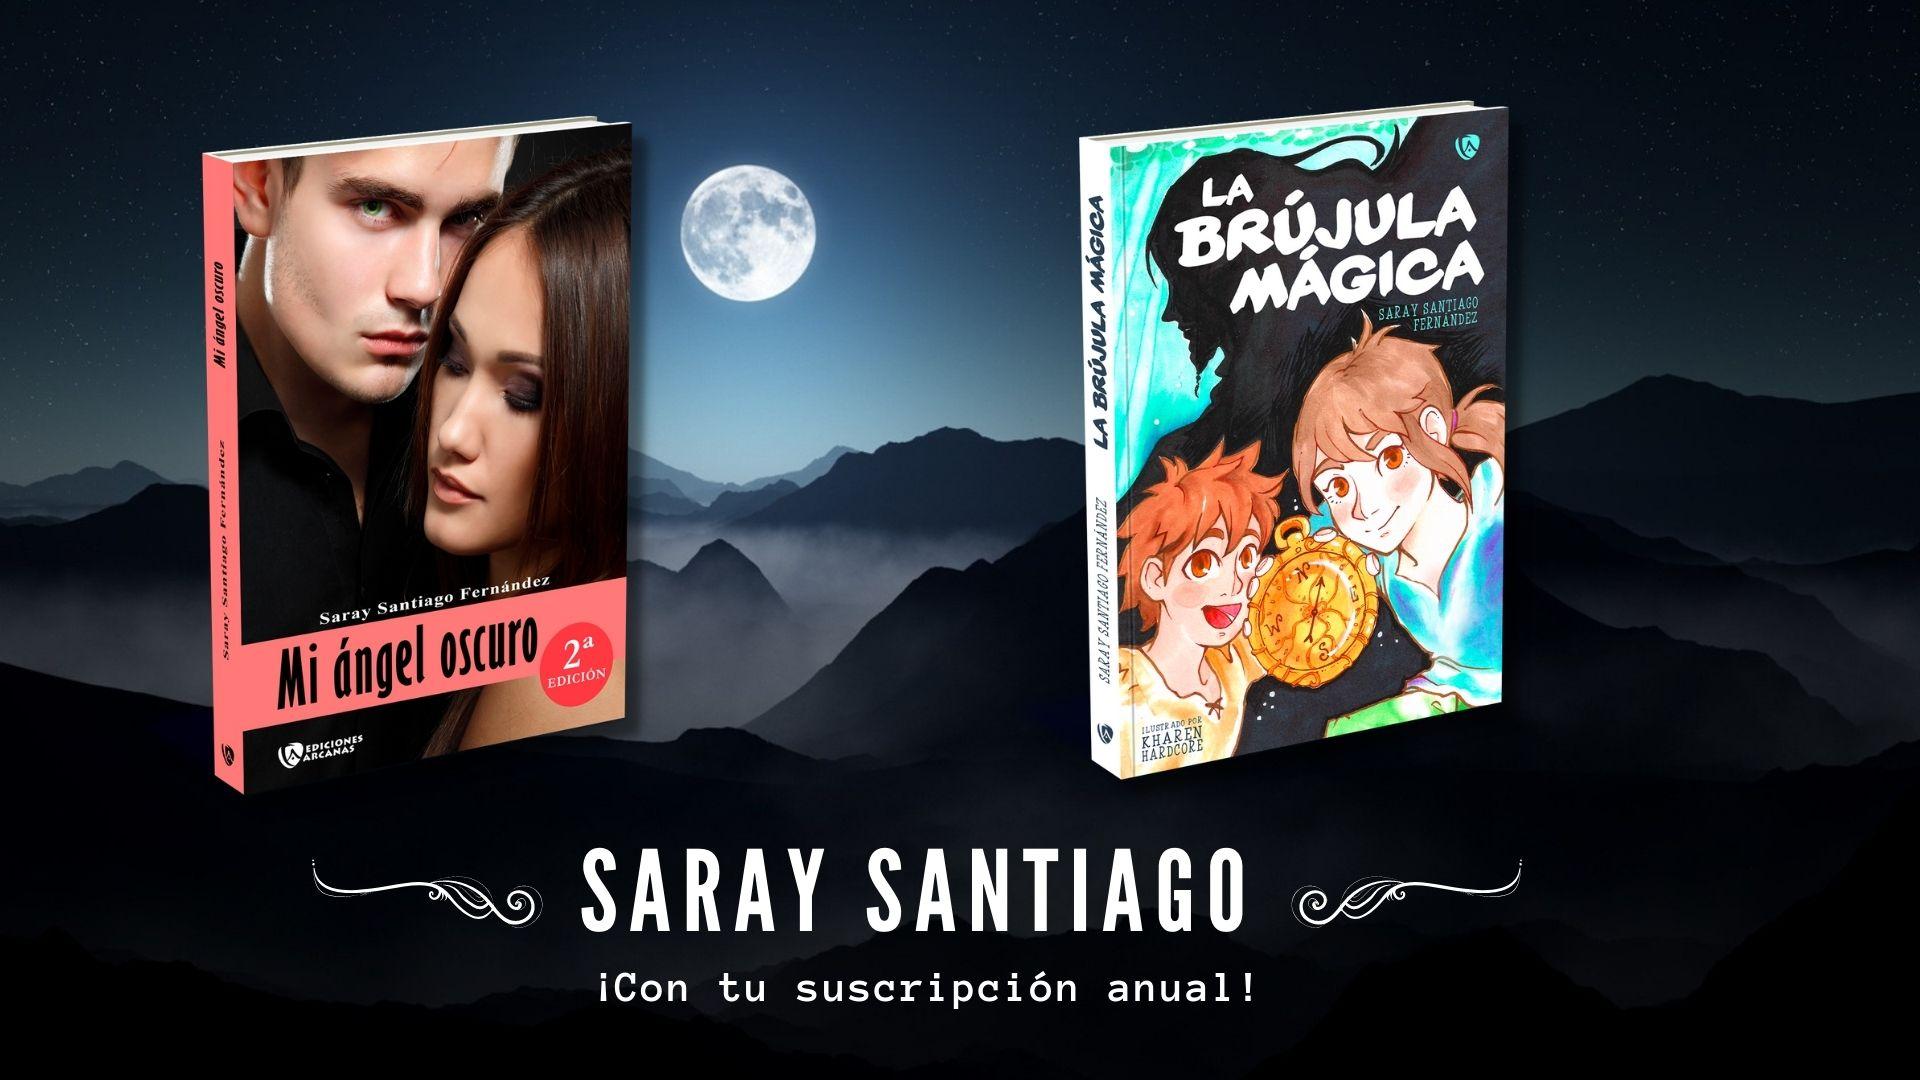 Saray Santiago